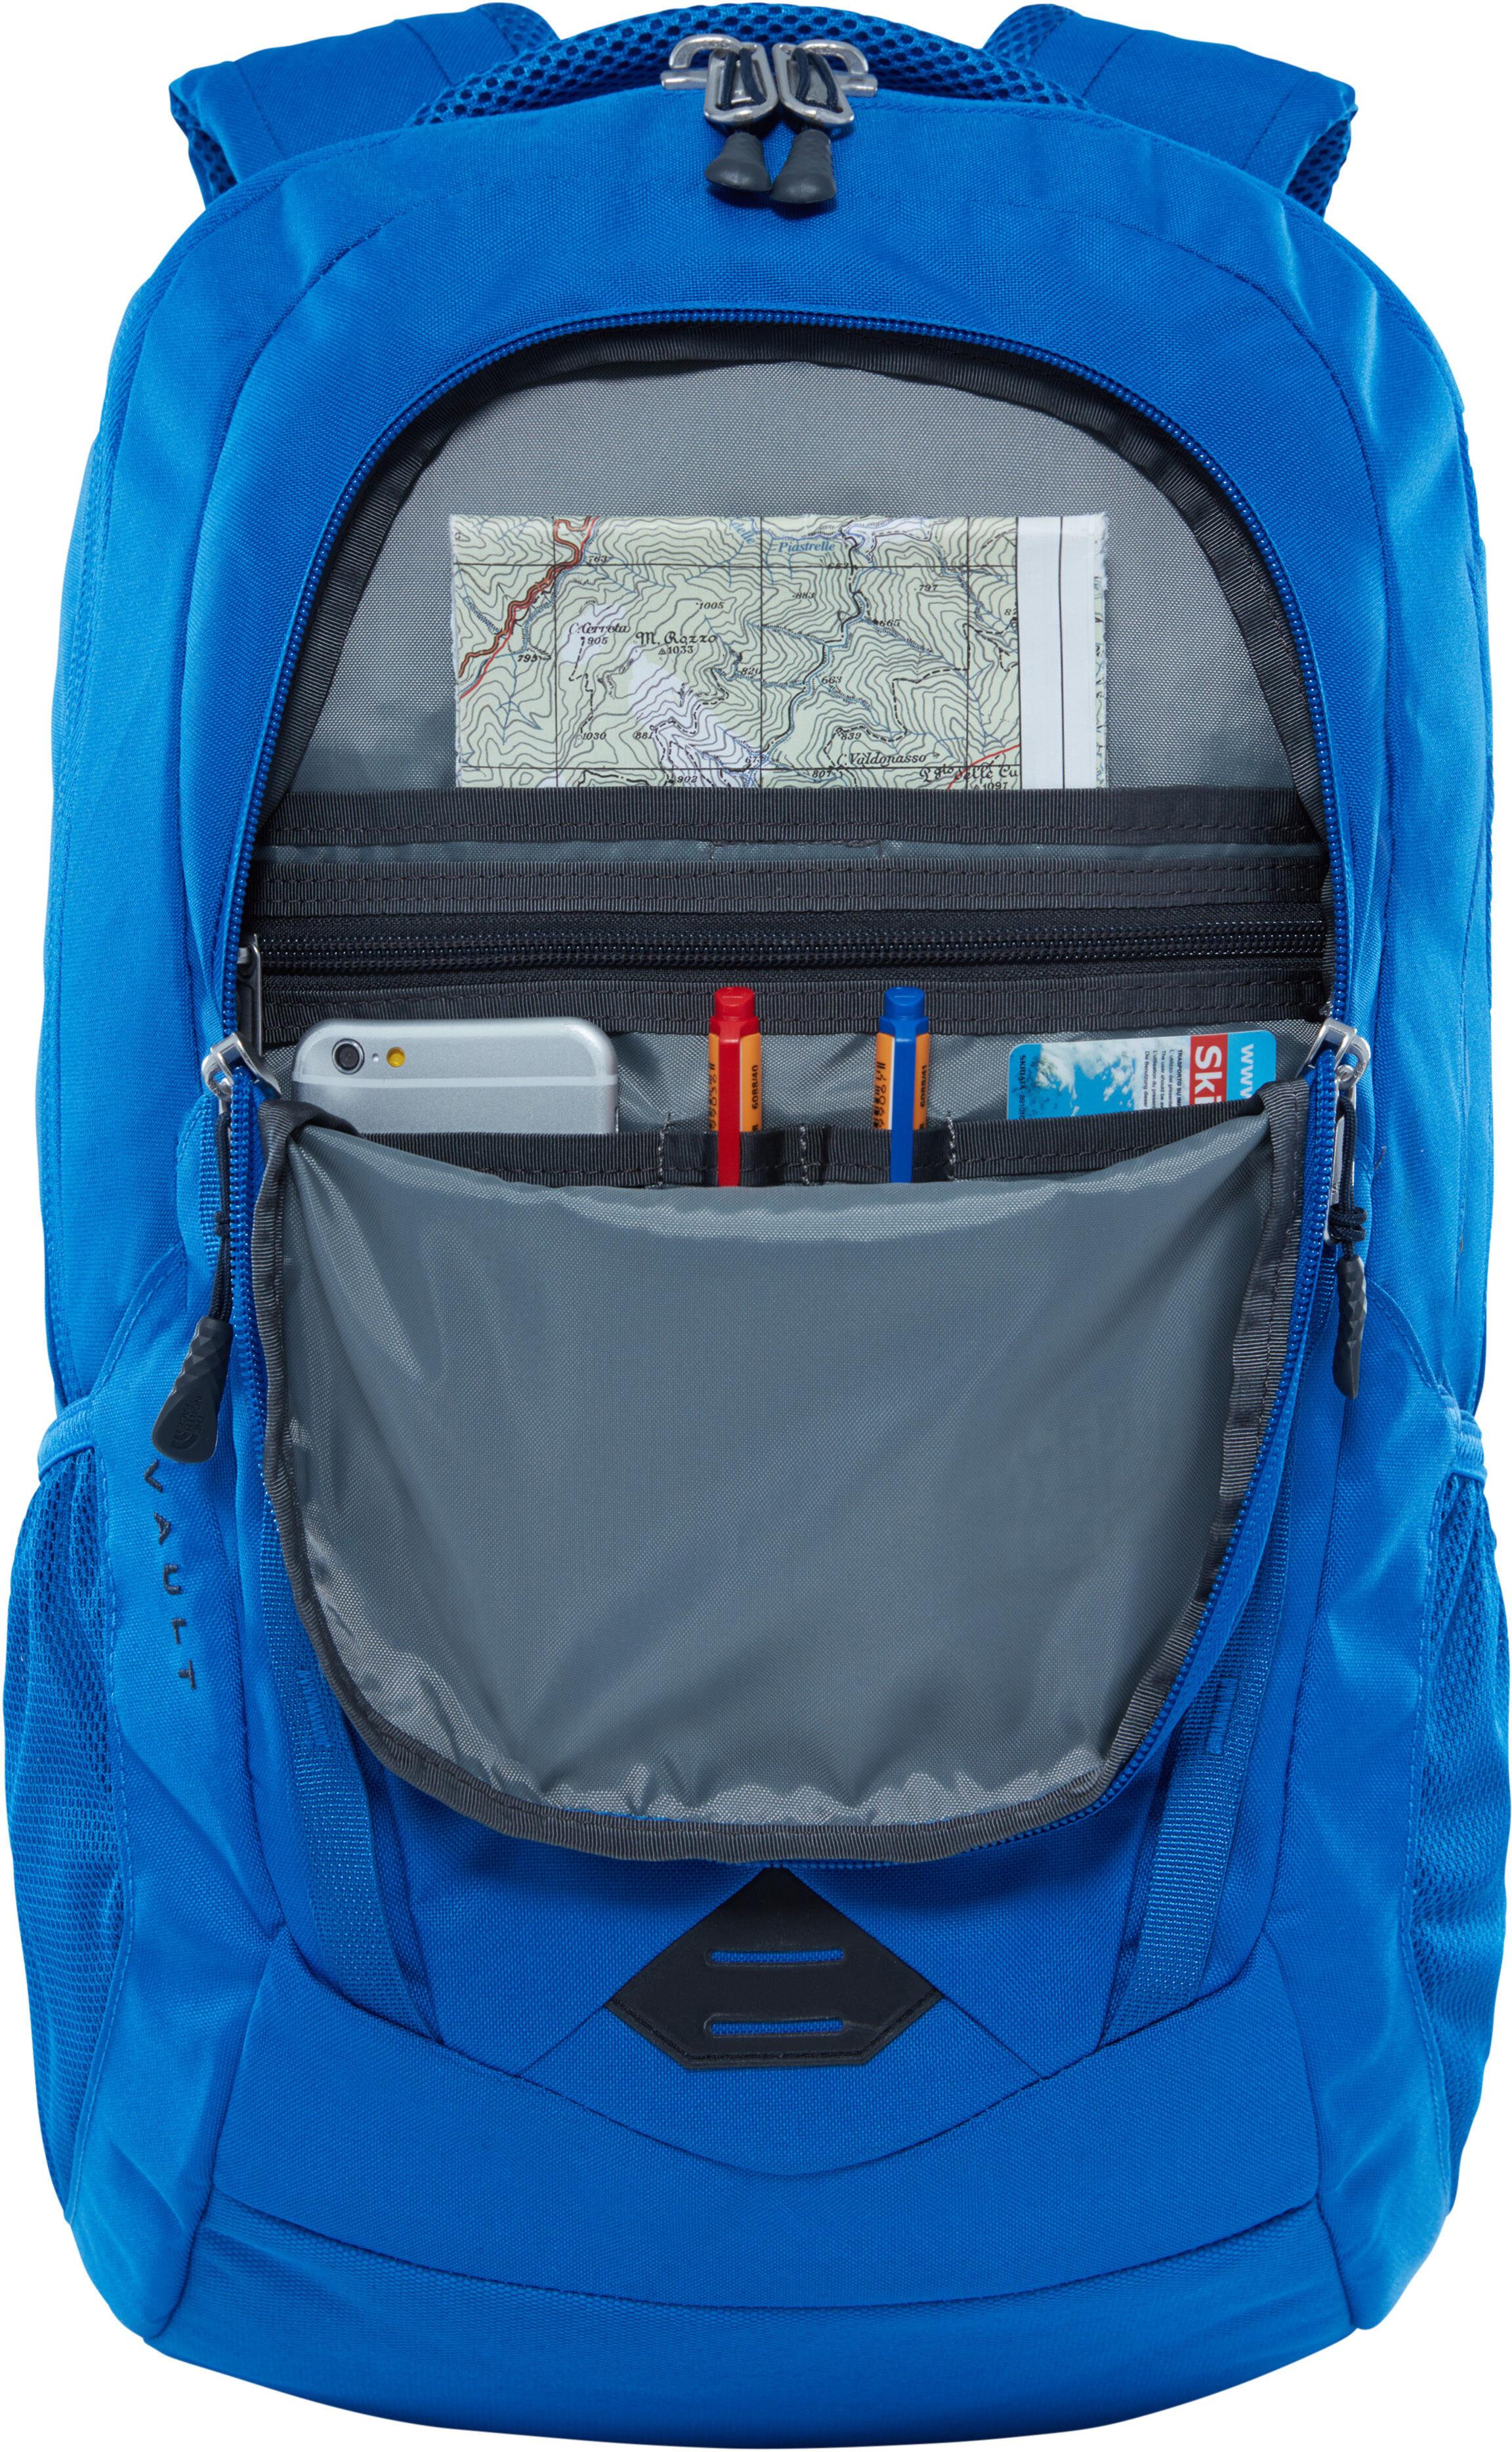 The North Face Vault Backpack 28 L Turkish Sea Urban Navy Online Headbeand Headwear Buff Helix Ocean Blue